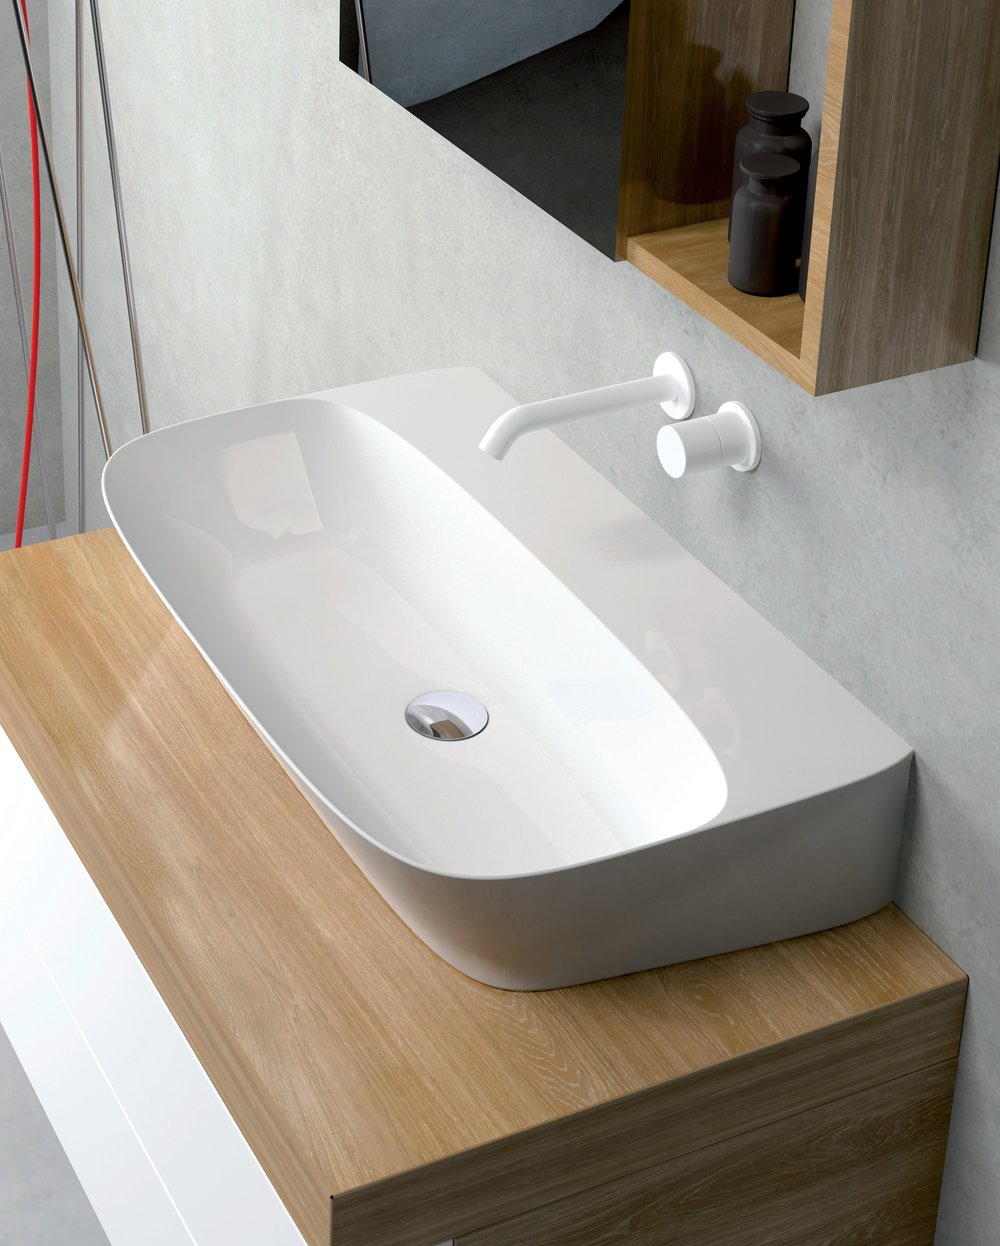 PRUA-Wall-hung-bidet-AZZURRA-sanitari-in-ceramica-297360-reladc15e5d.jpg